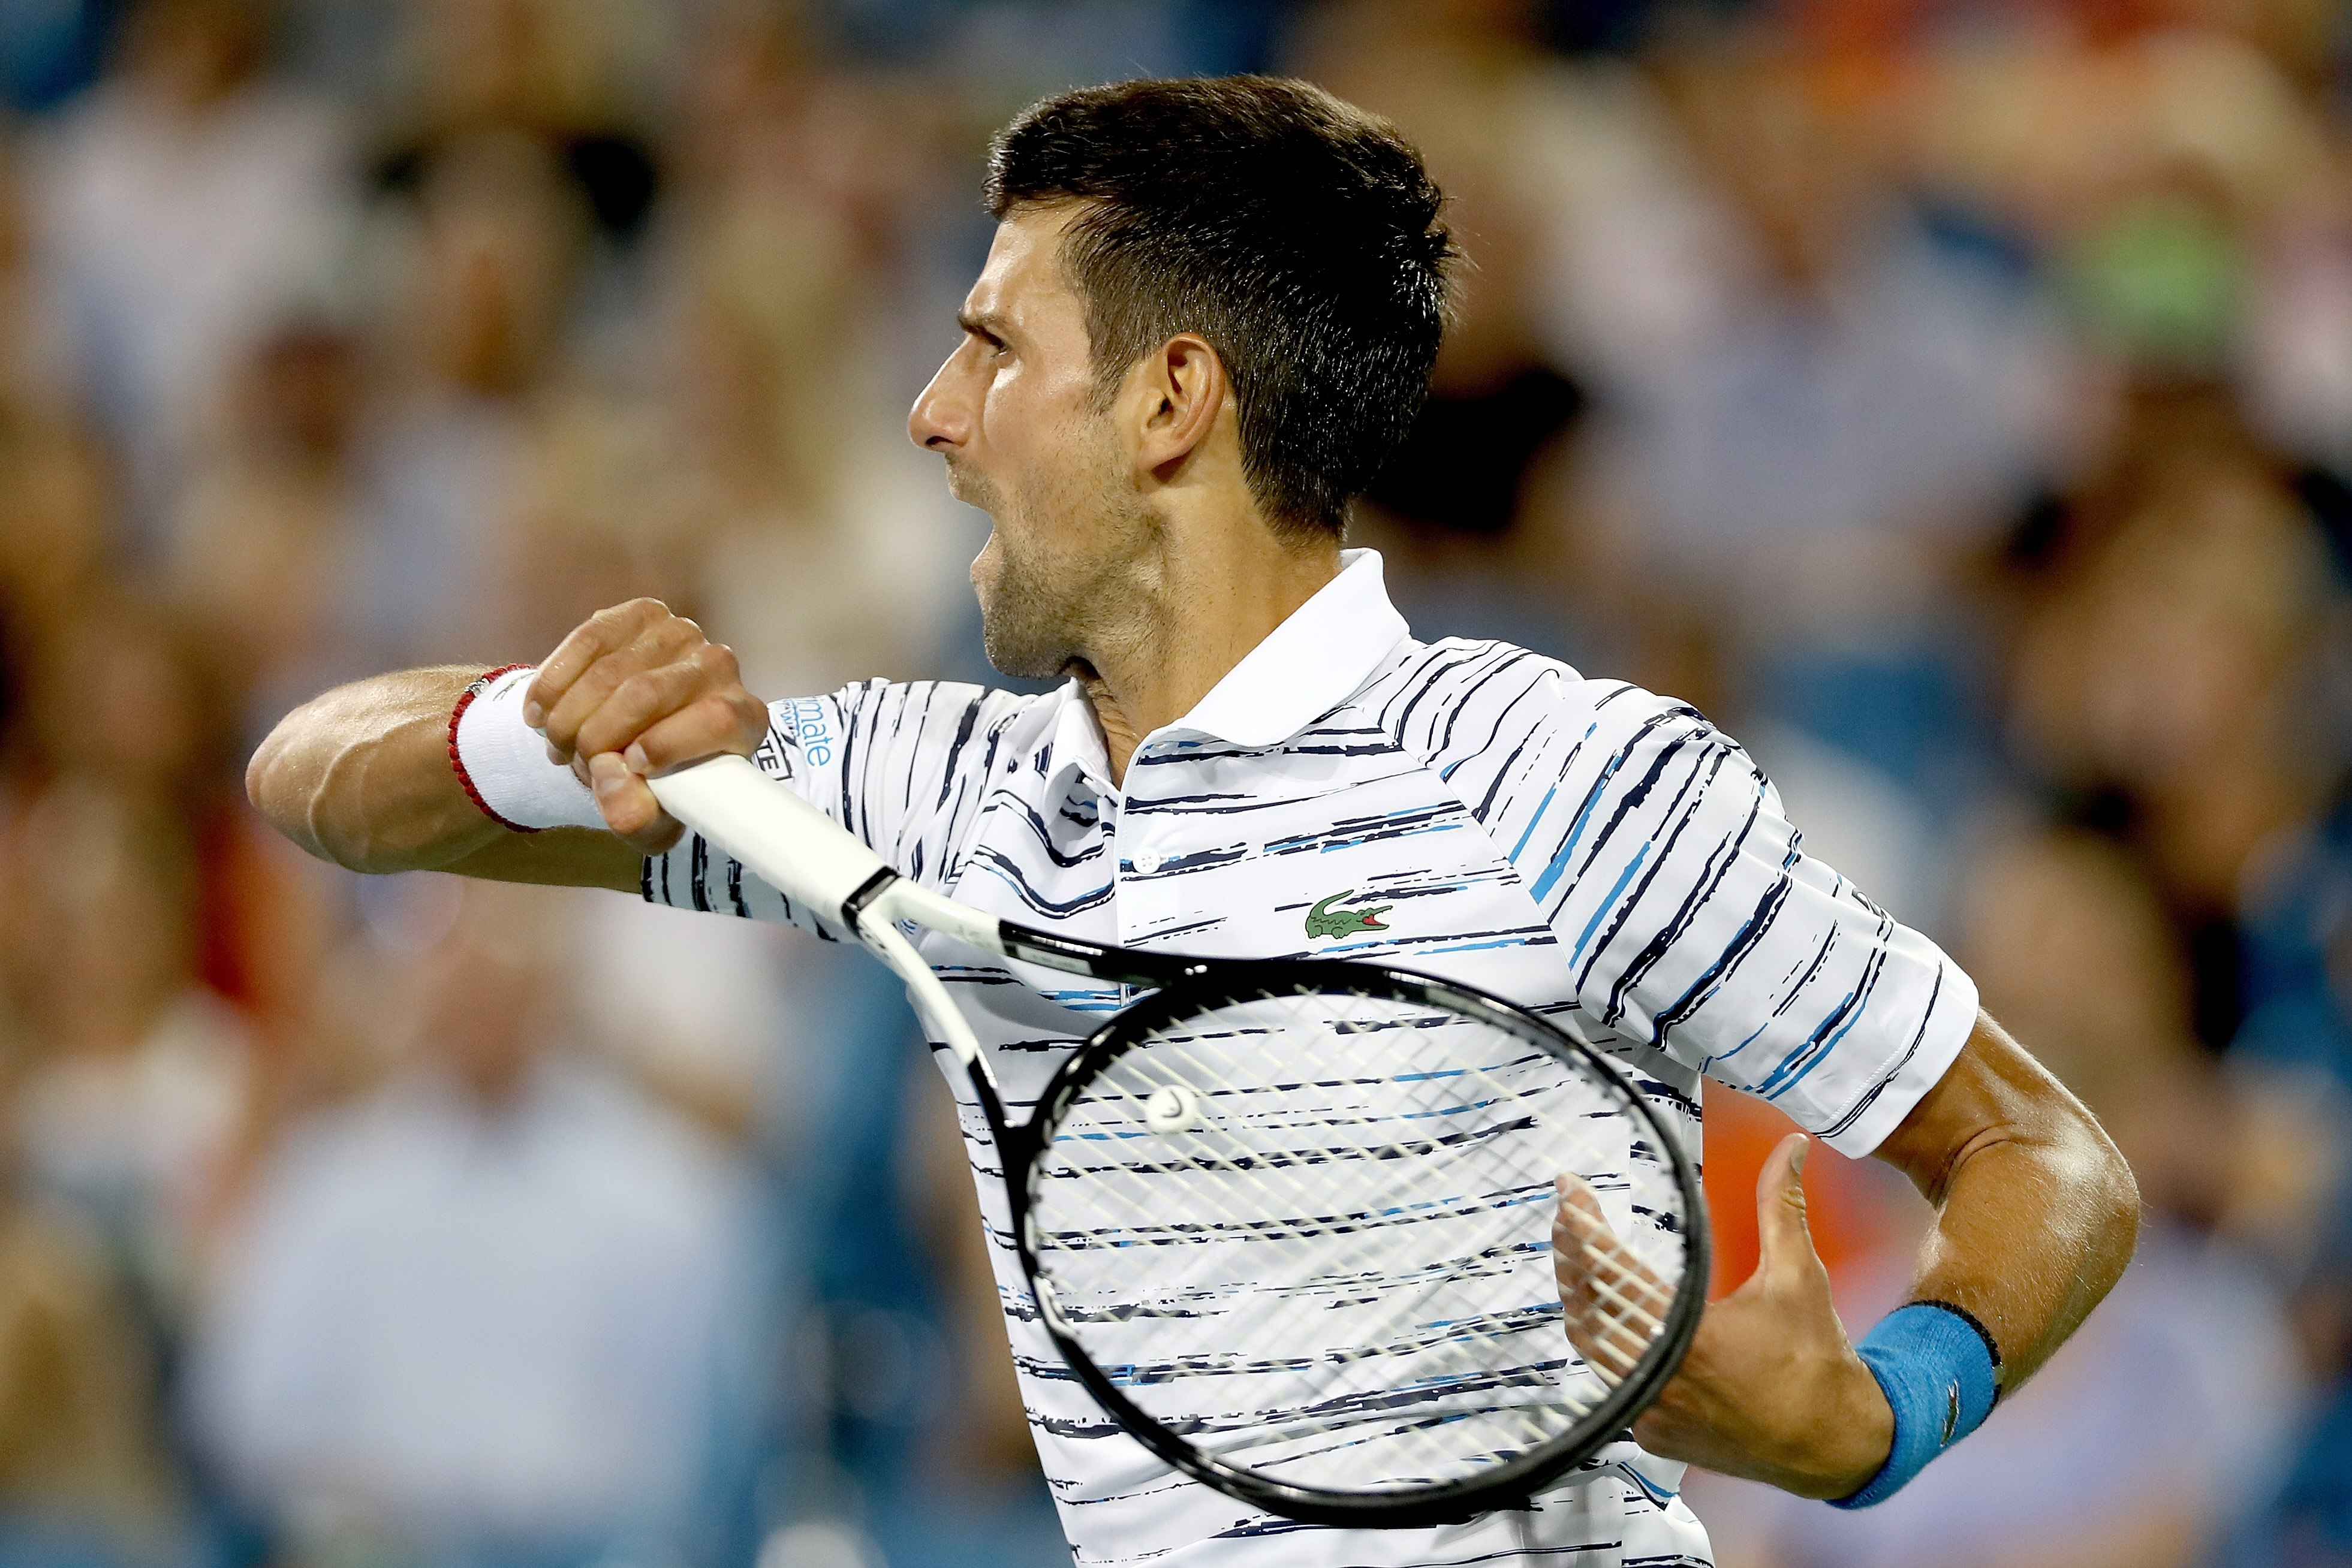 US Open Djokovic Serena